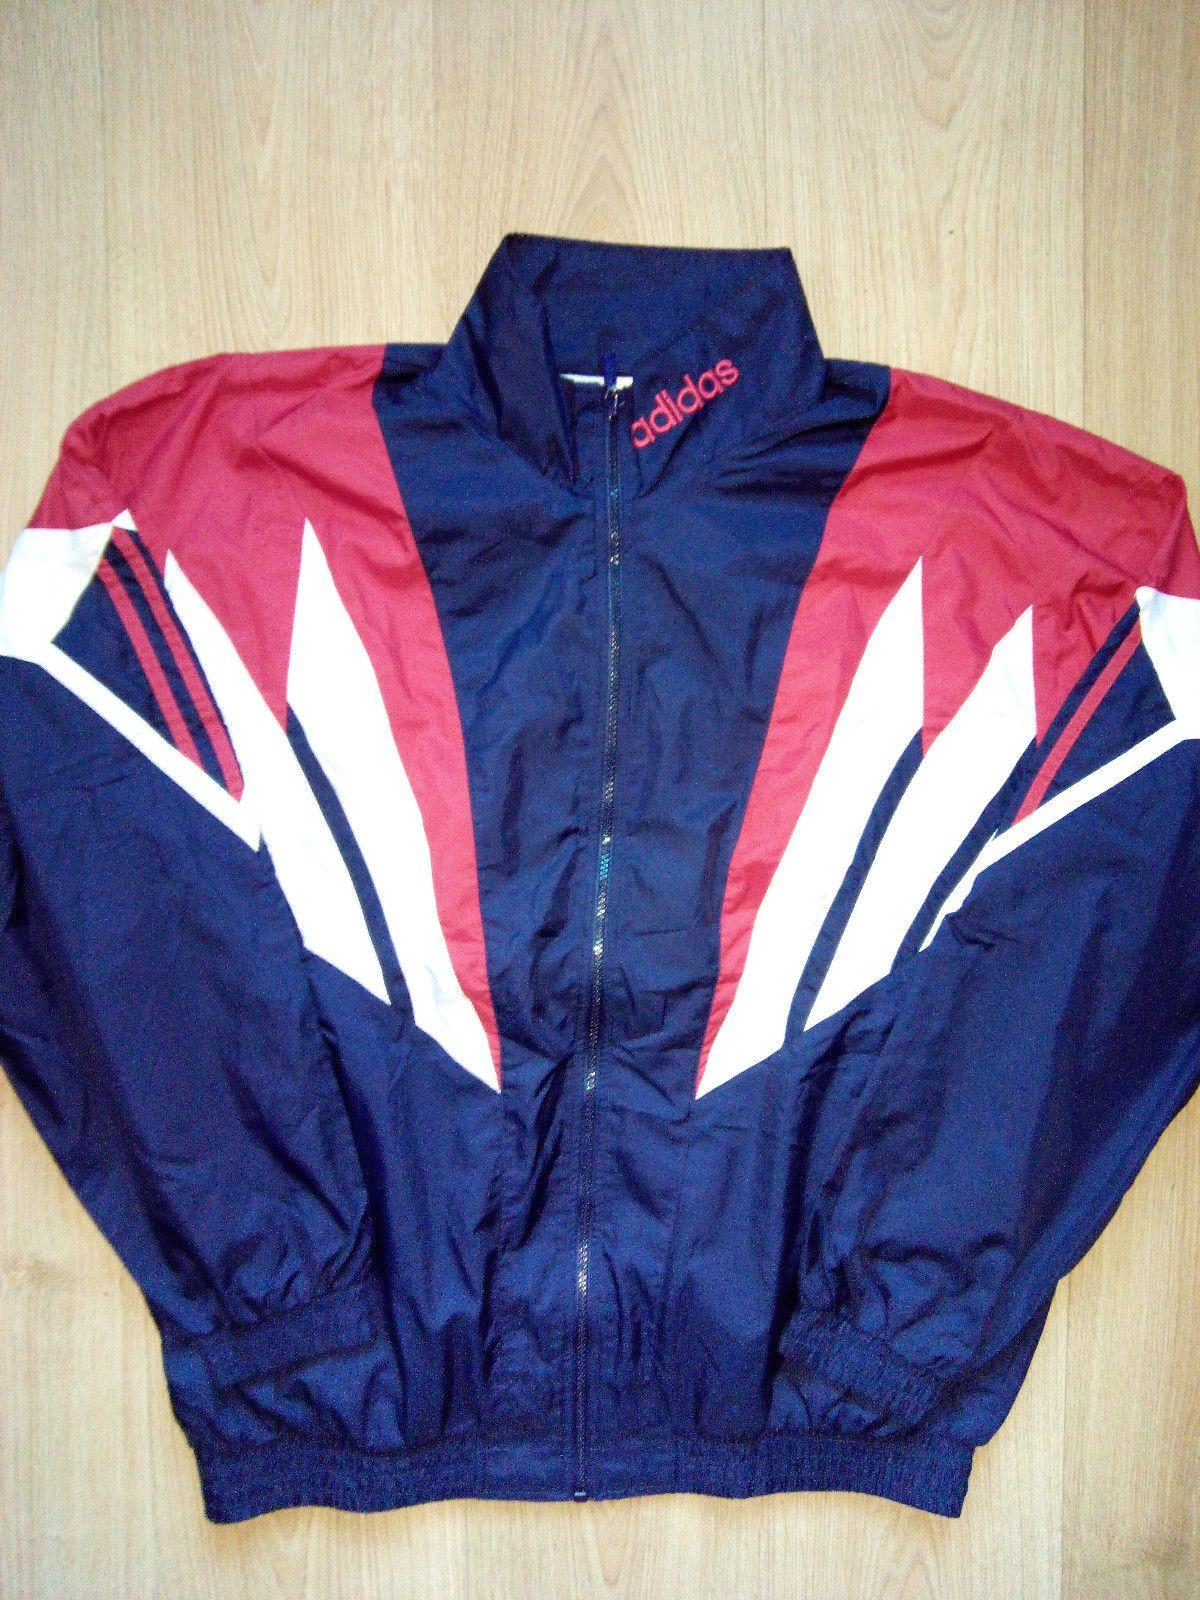 Adidas Originals 90's Vintage Mens Tracksuit Top Jacket